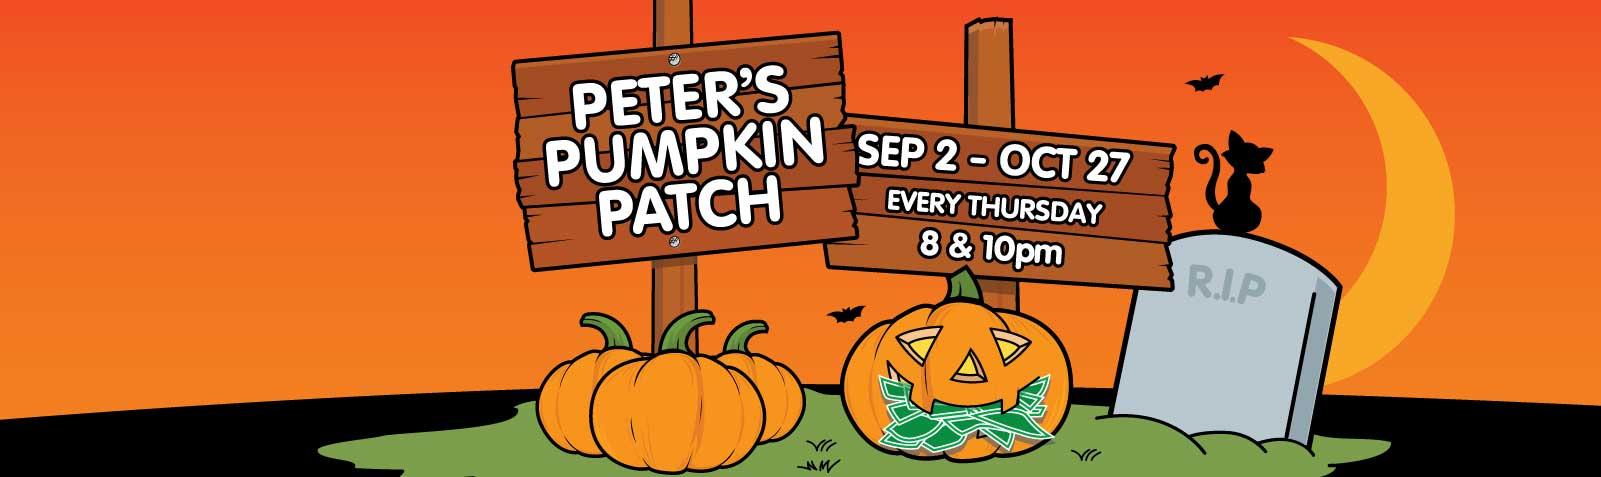 MKT16-234-Peters-Pumpkin-Patch-Slider